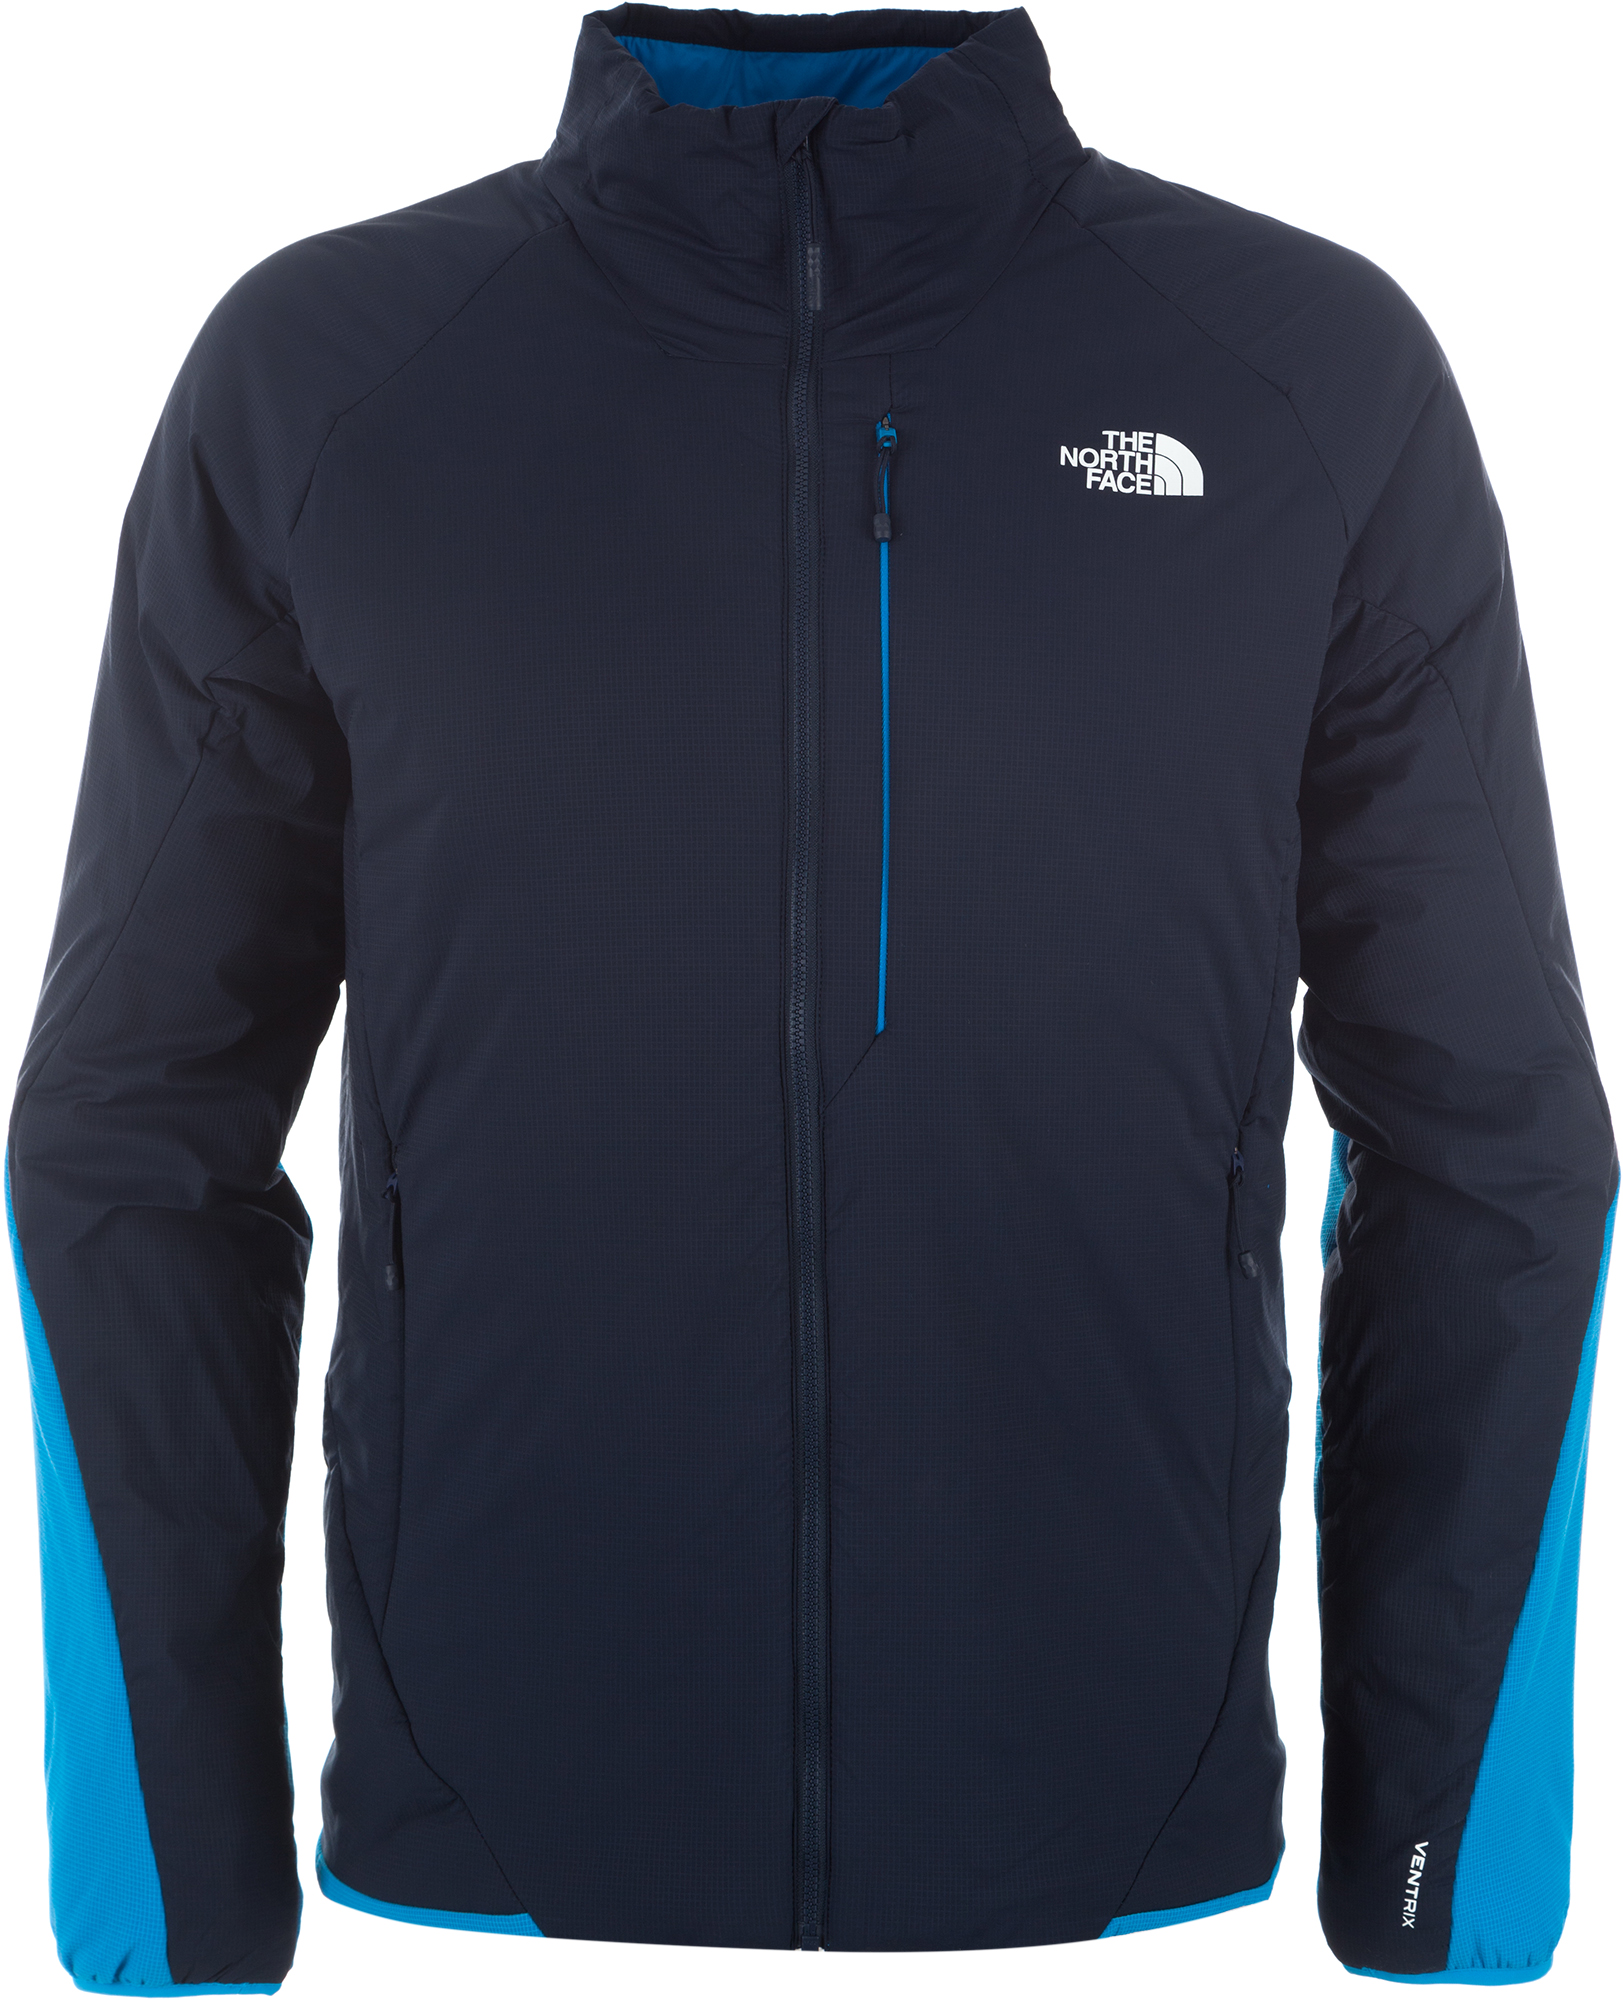 The North Face Куртка утепленная мужская The North Face Ventrix, размер 50